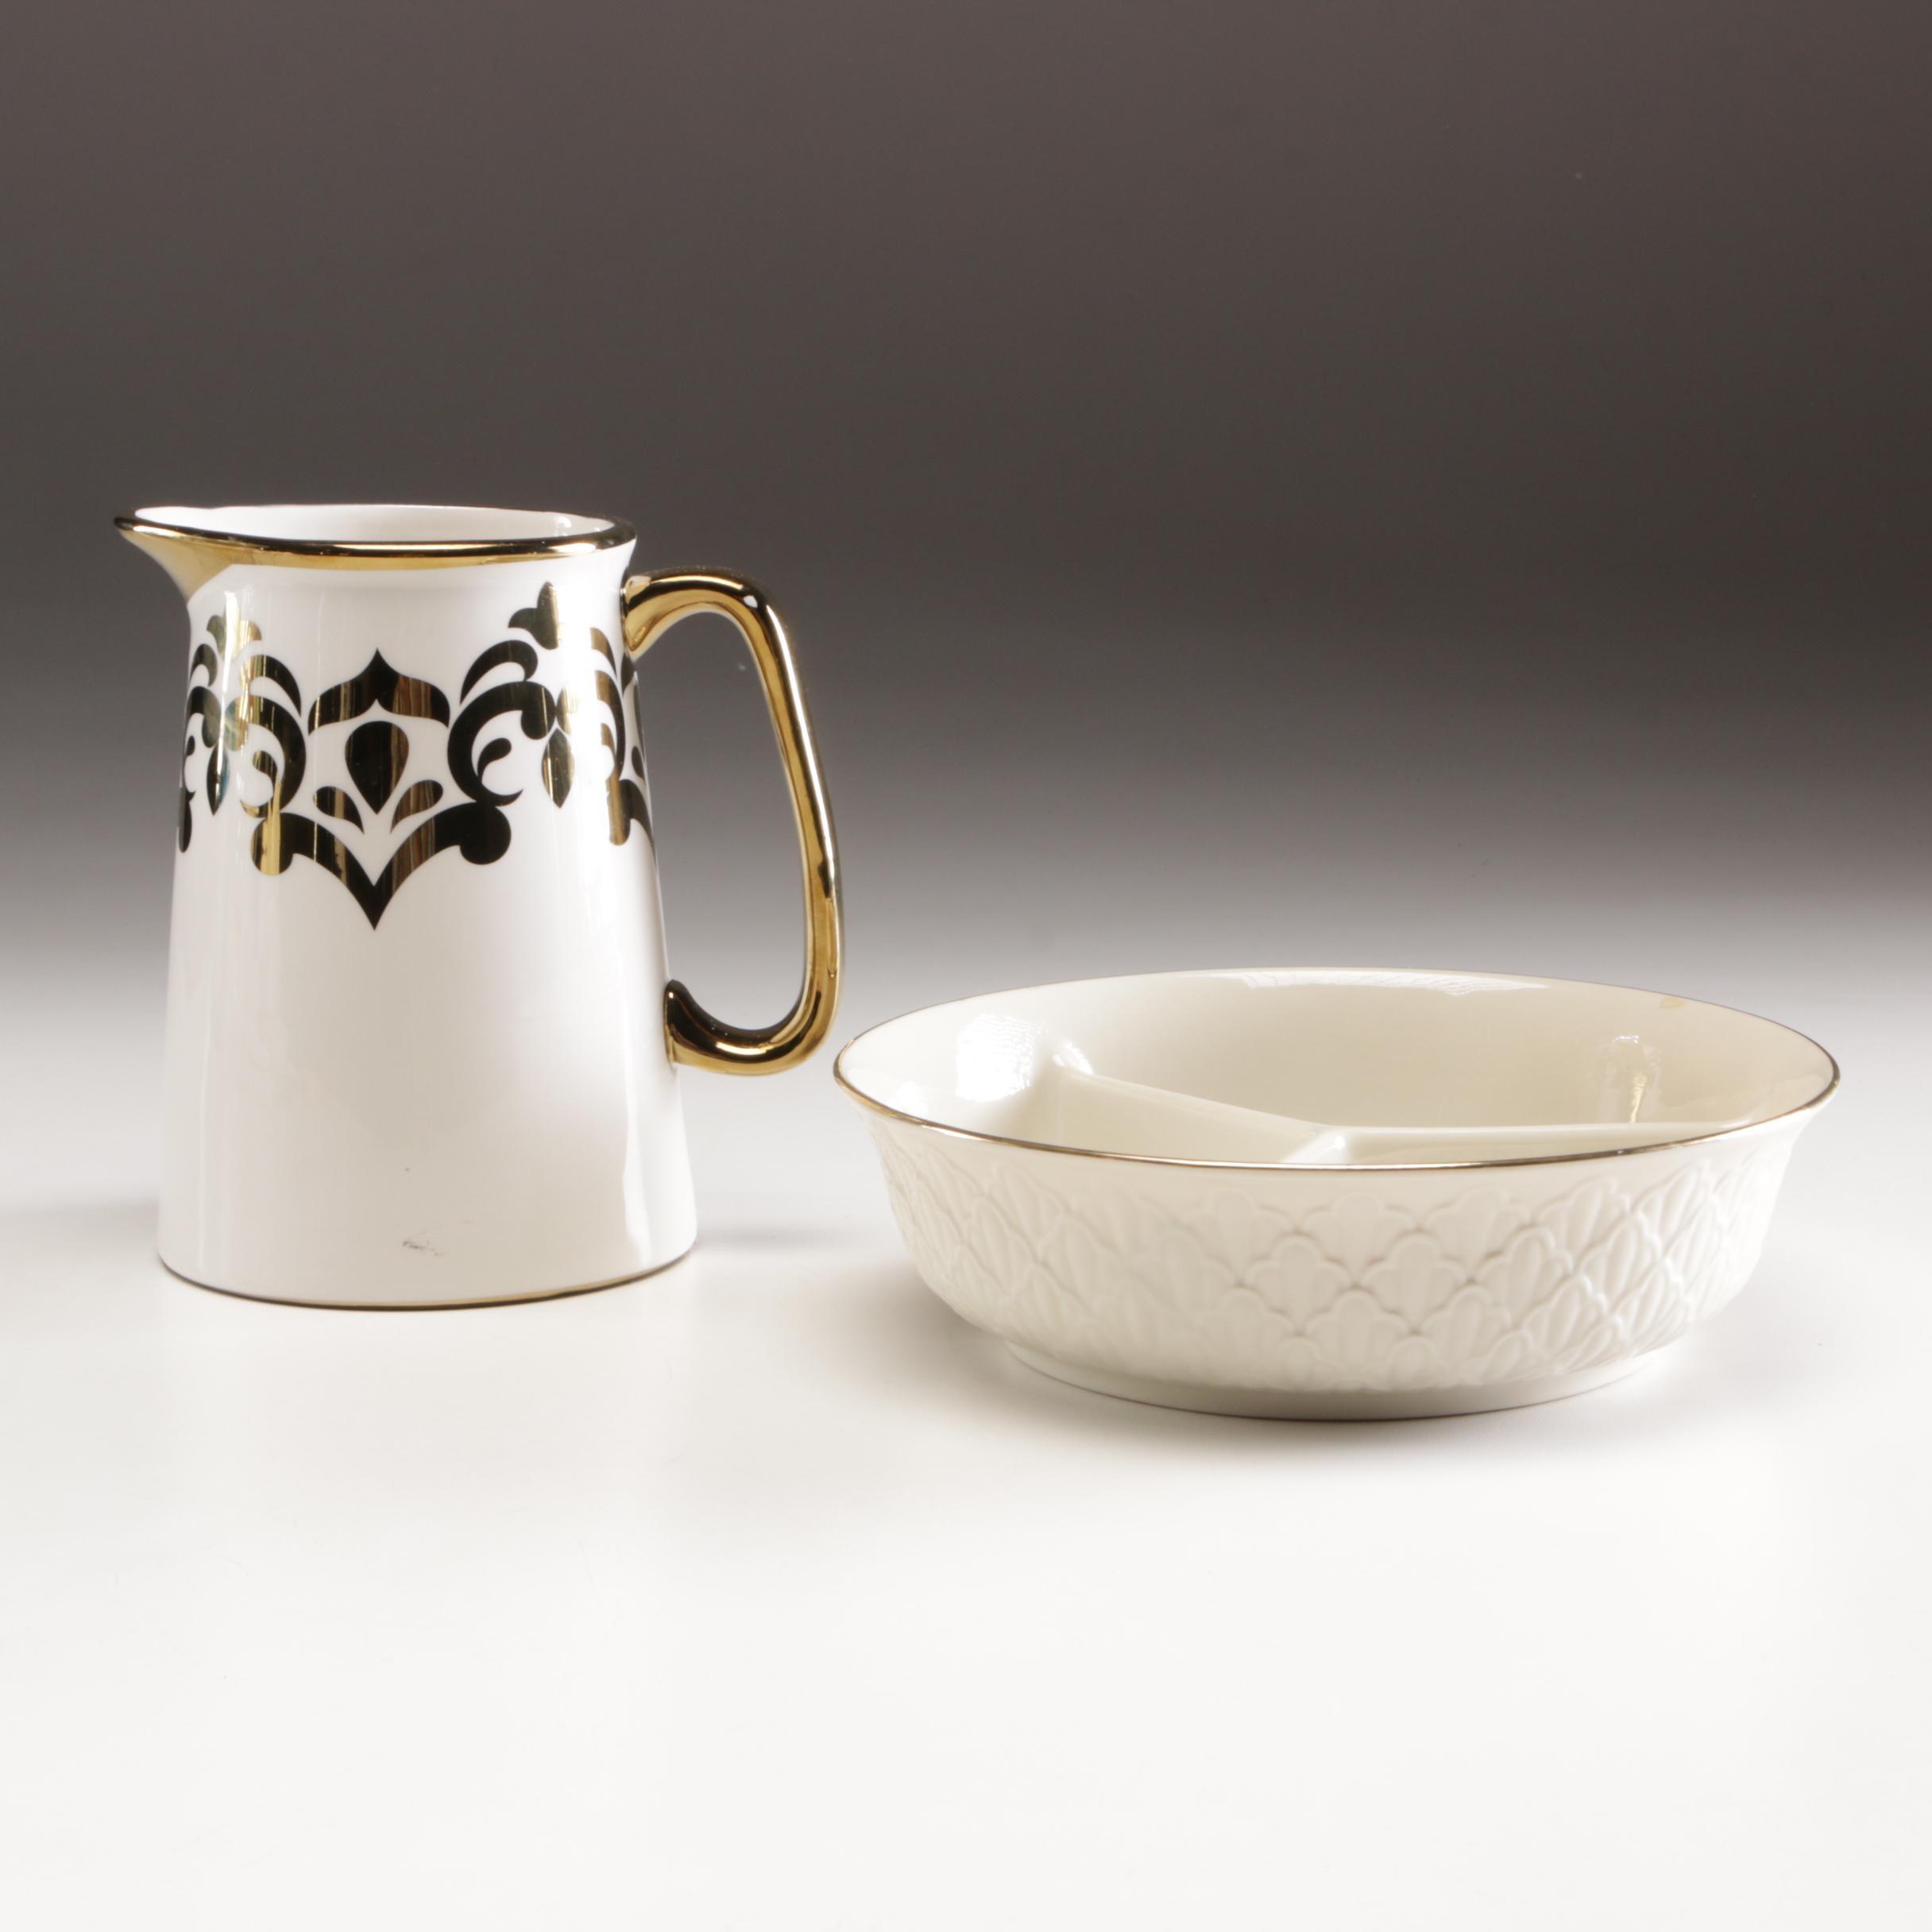 Lenox Porcelain Divided Serving Dish and Ceramic Pitcher